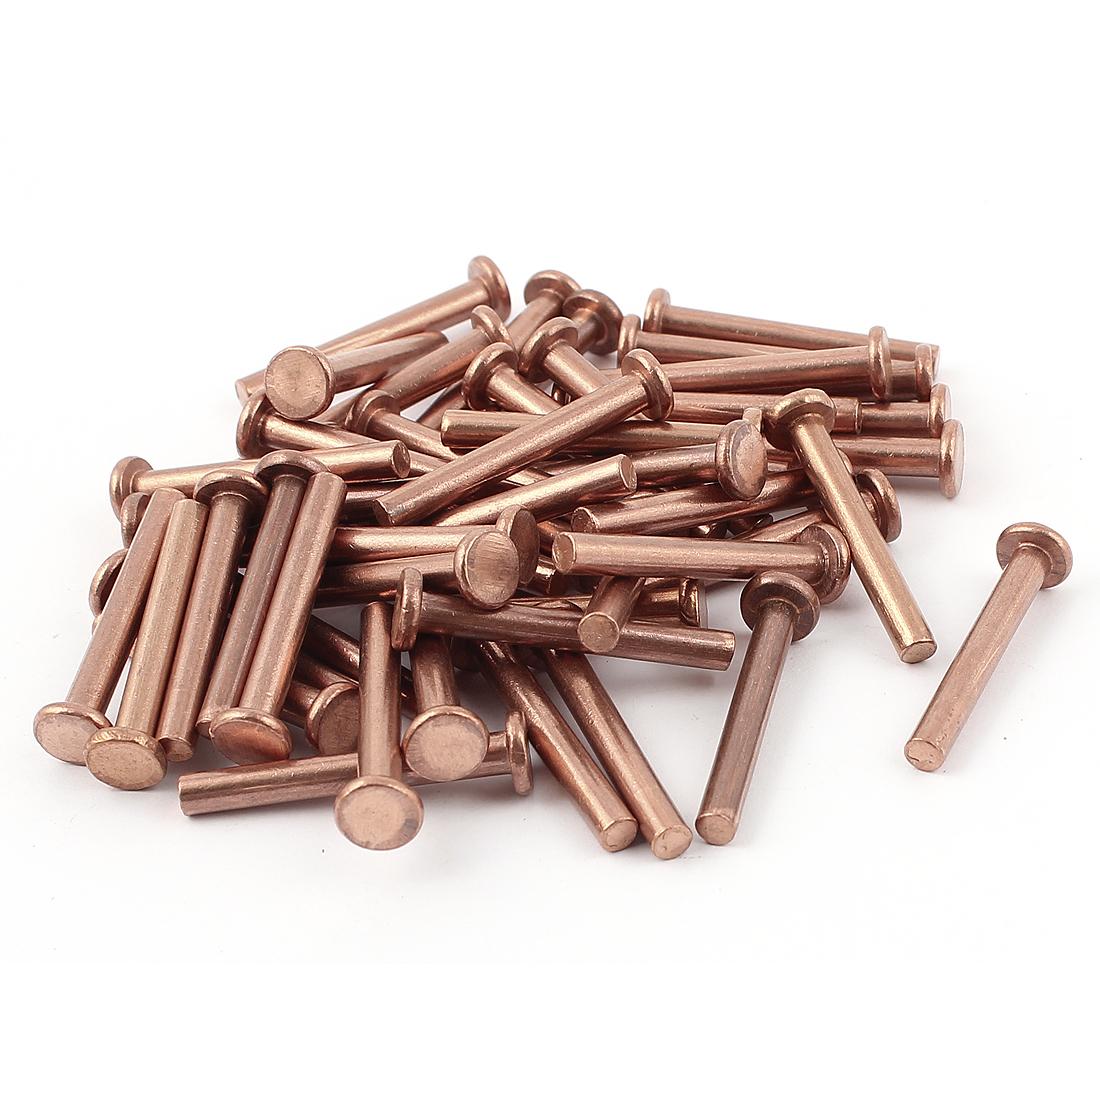 "50 Pcs 5/32"" Diameter 1 3/16"" Long Shank Flat Head Copper Solid Rivets Fasteners"